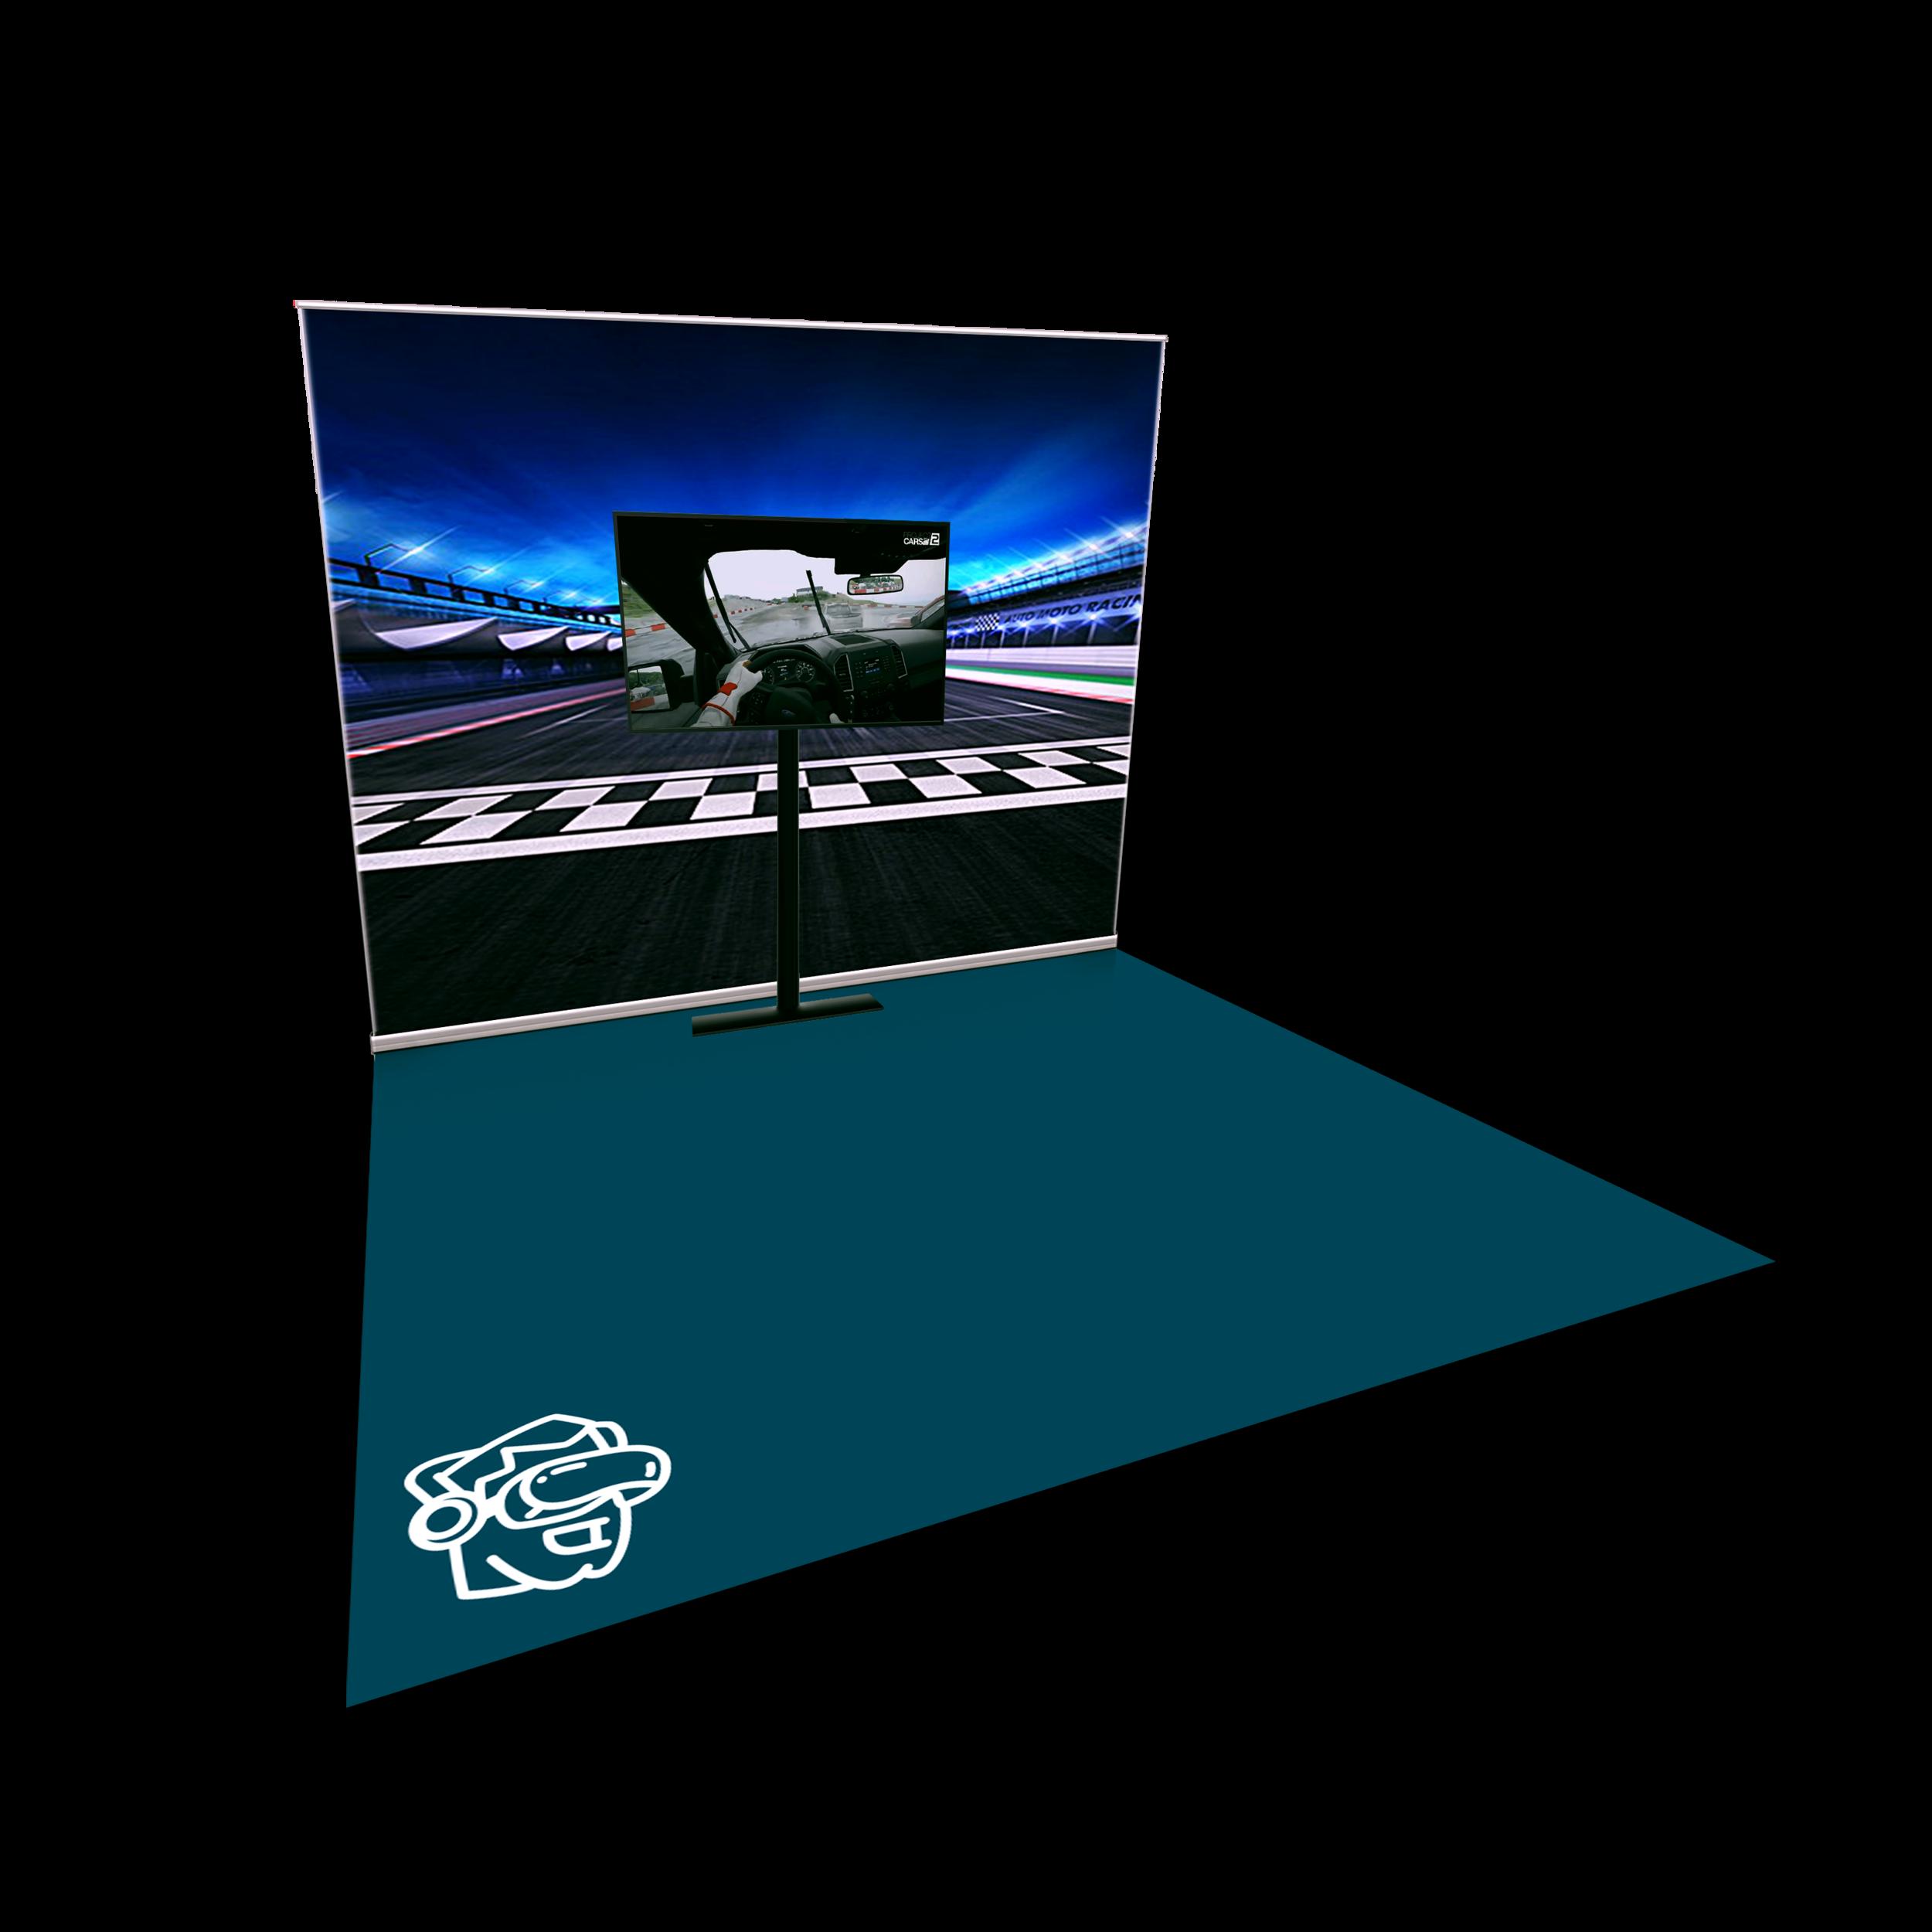 Setup_Mockup_-_Project_Cars.png